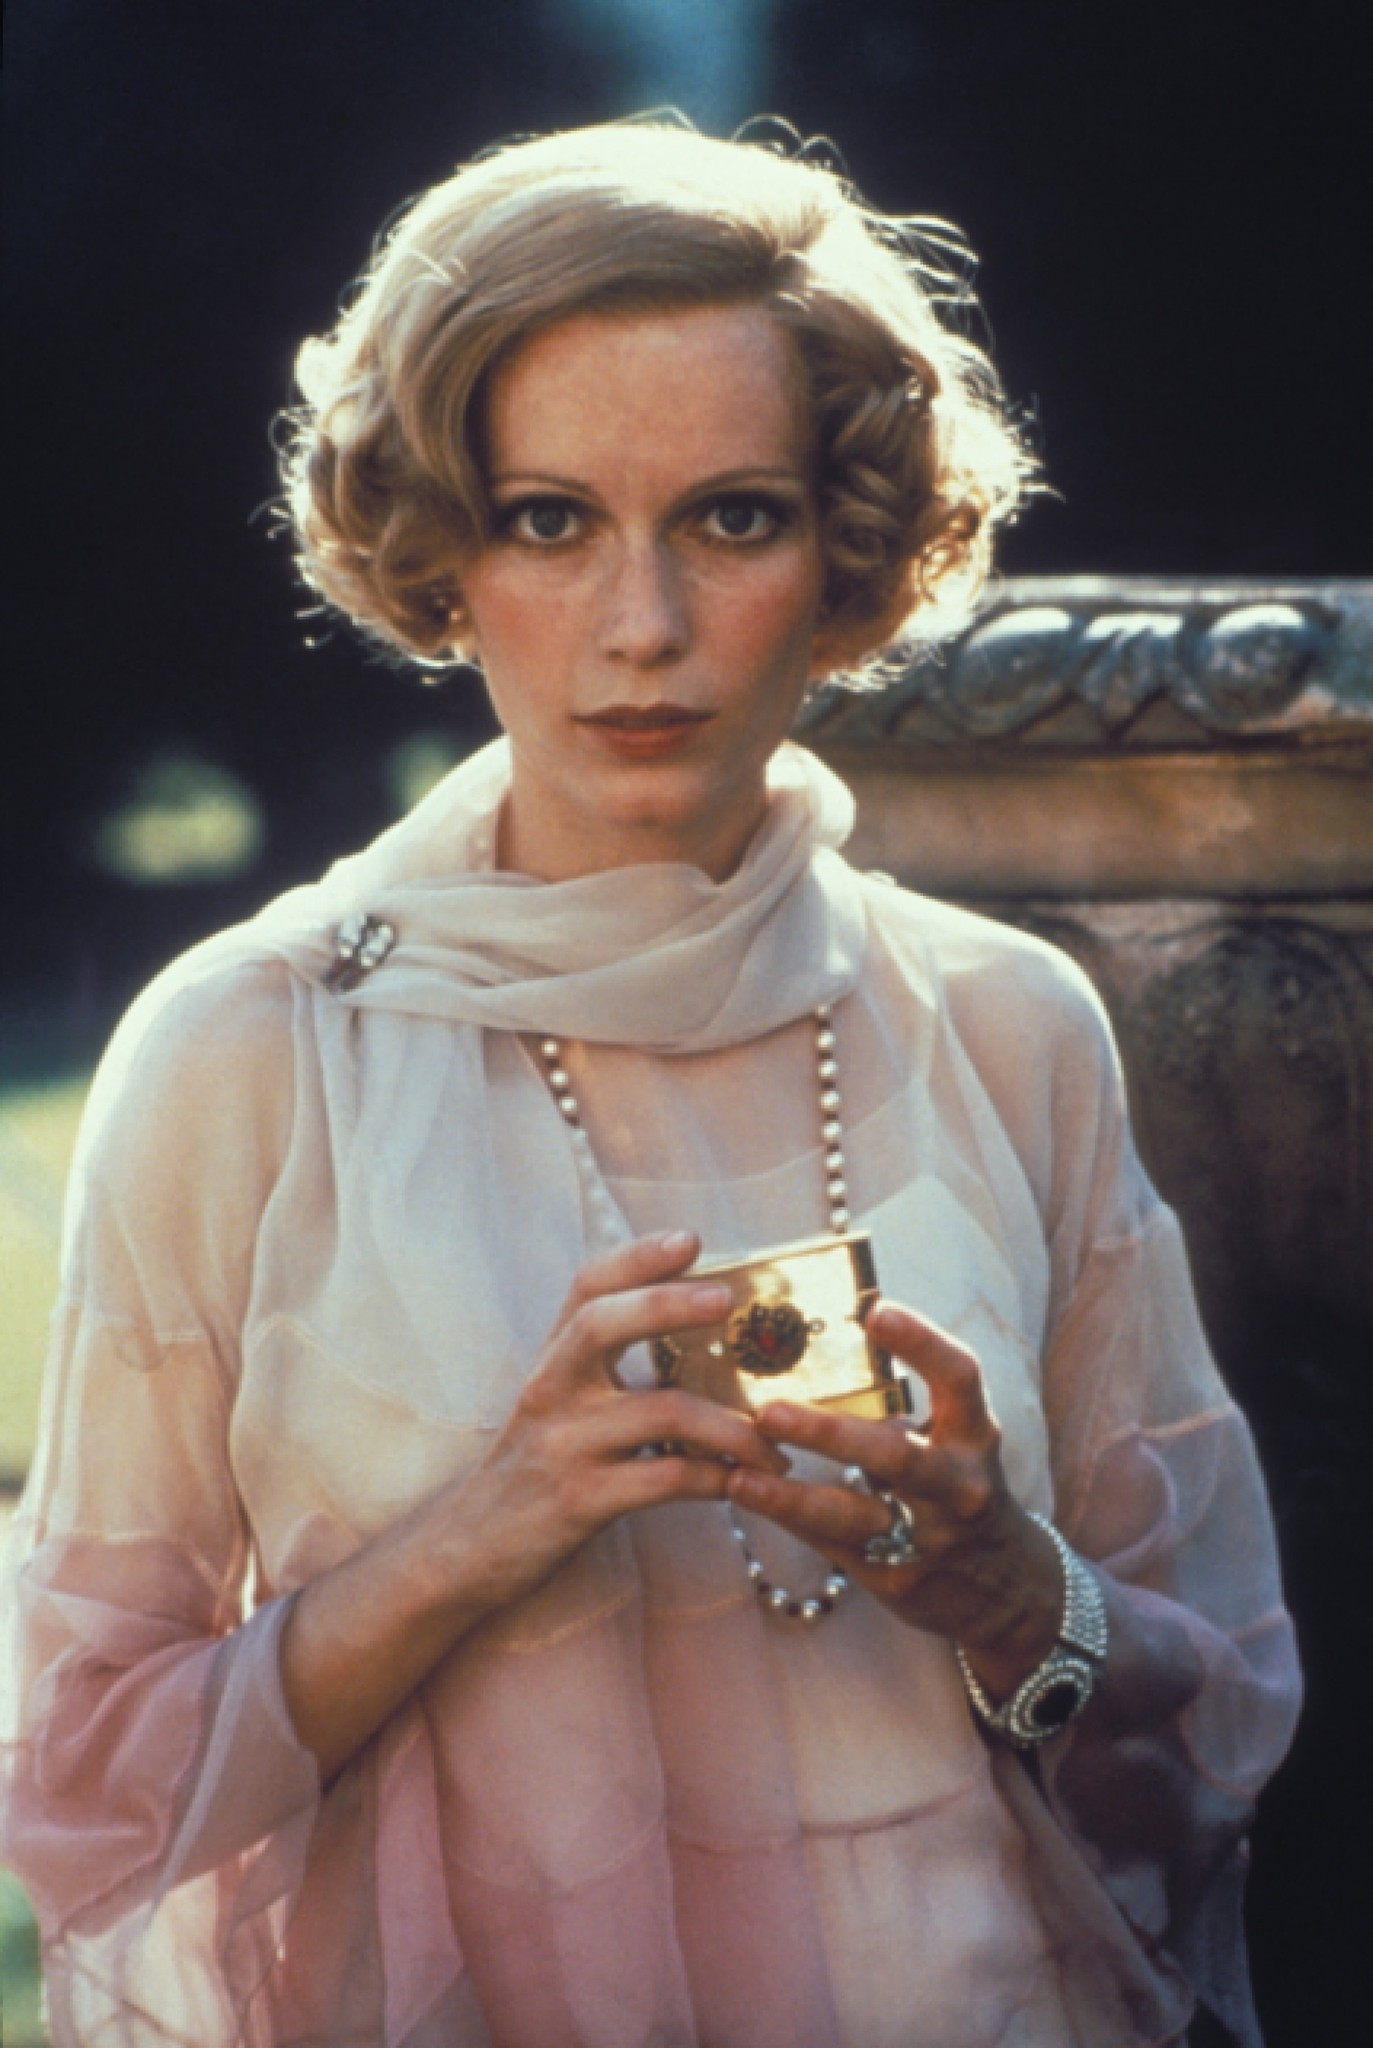 c4f4cbff0de4 The Great Gatsby (1974) - Photo Gallery - IMDb